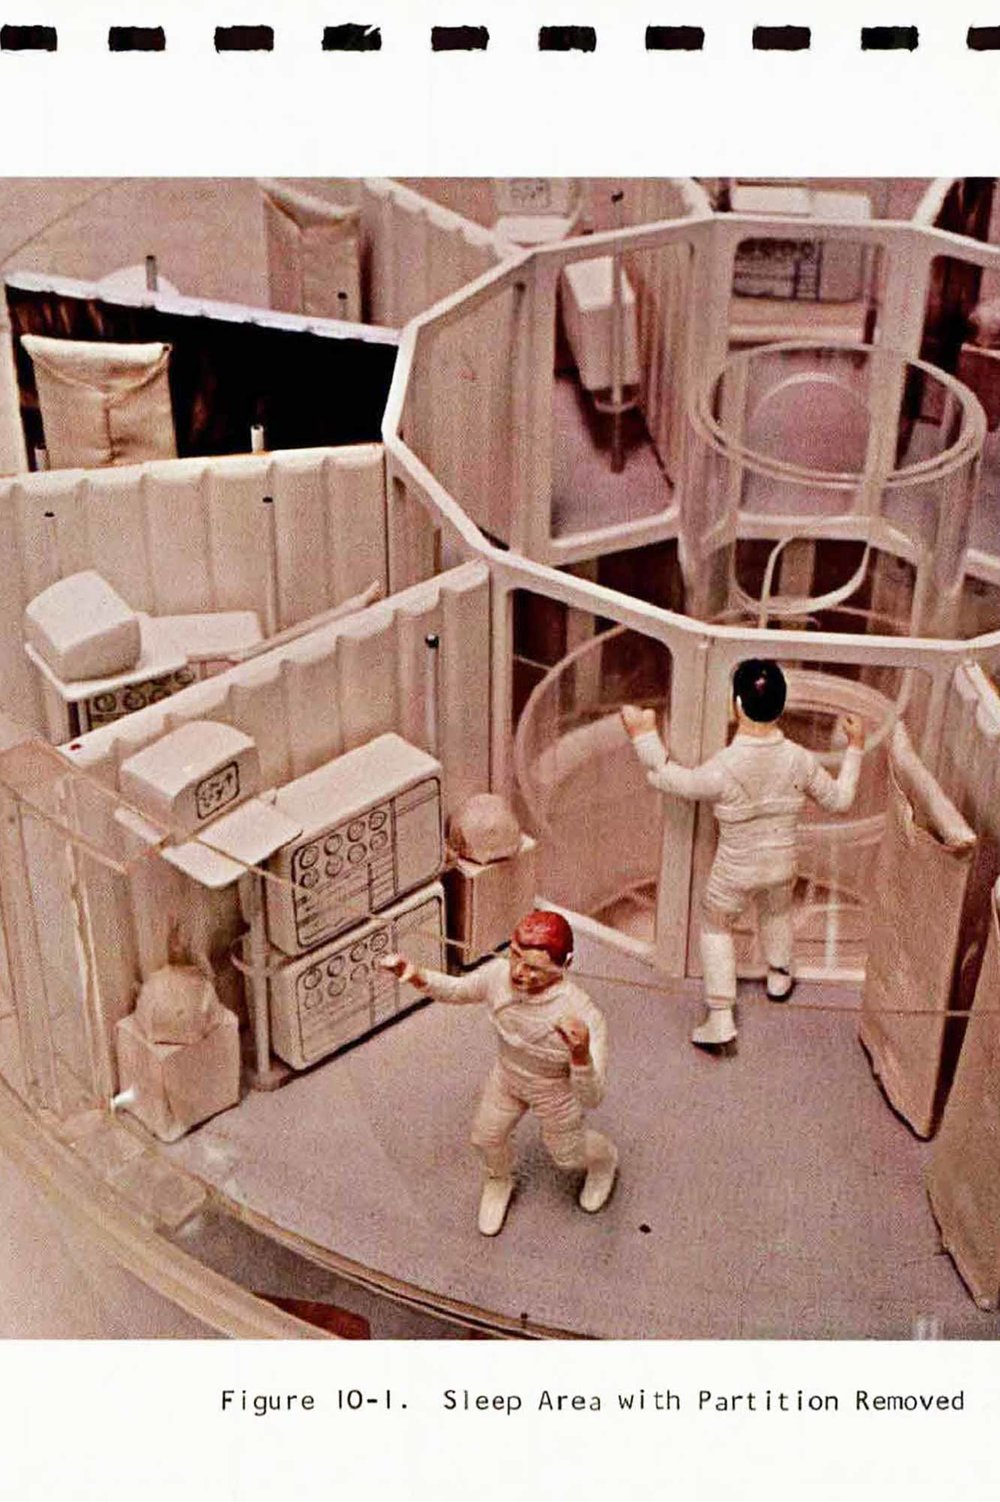 Habitation guidelines c. 1971